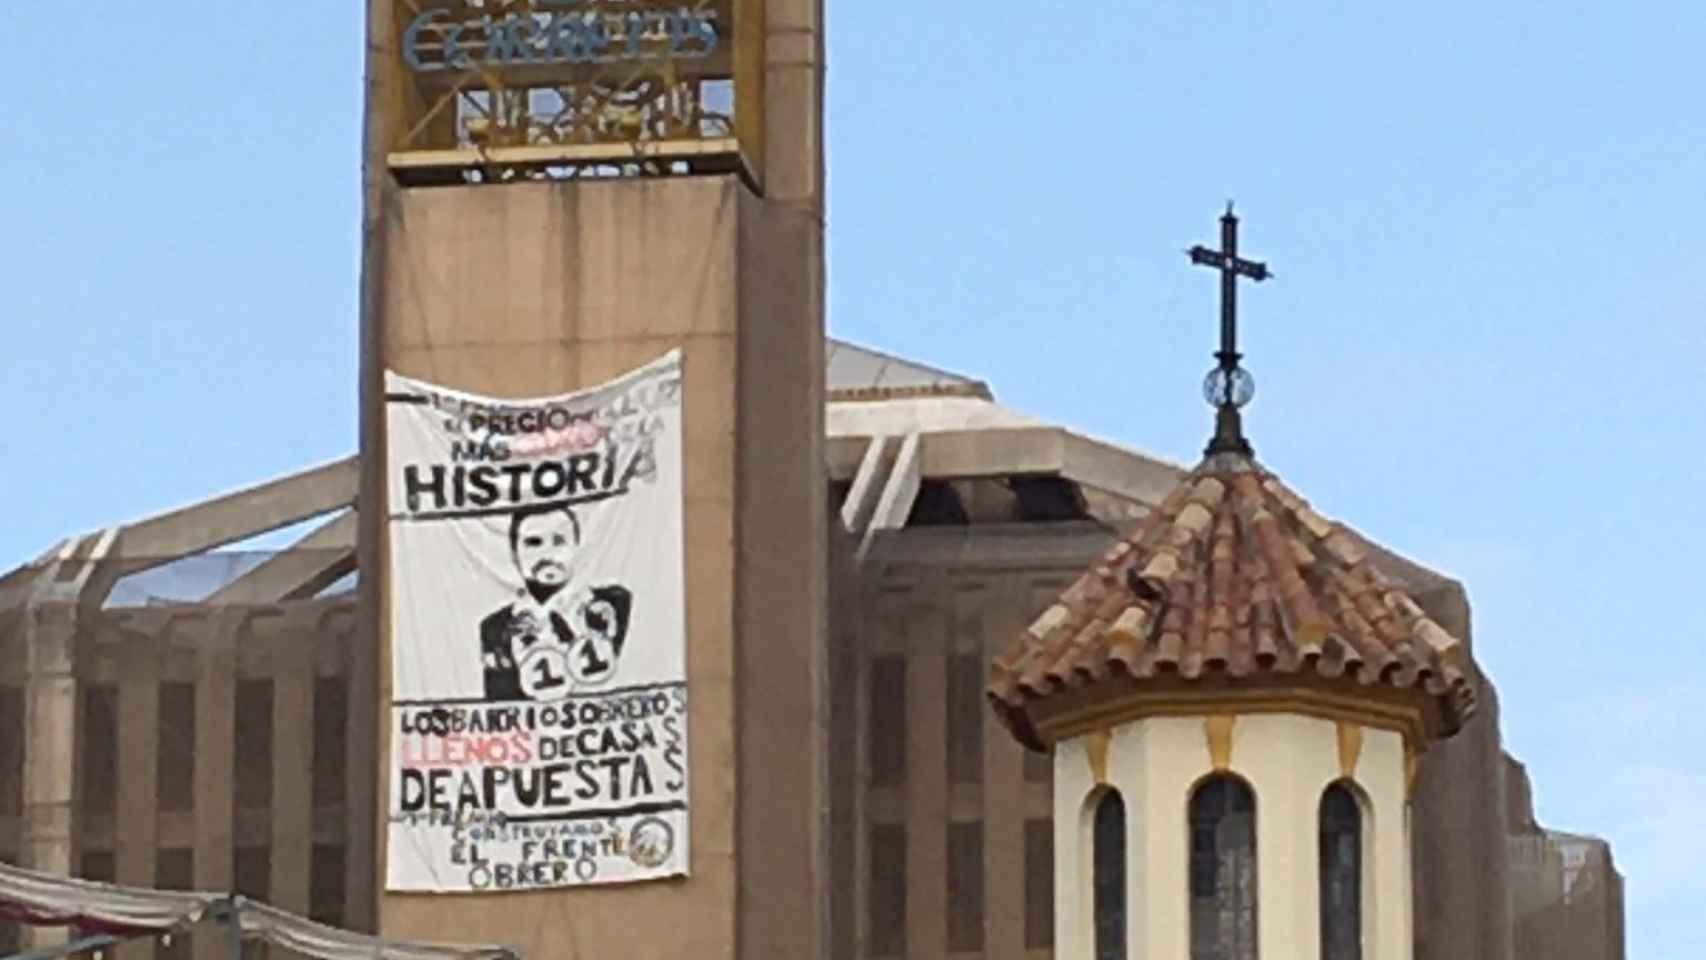 Así desplegó el Frente Obrero la pancarta contra Garzón en Málaga